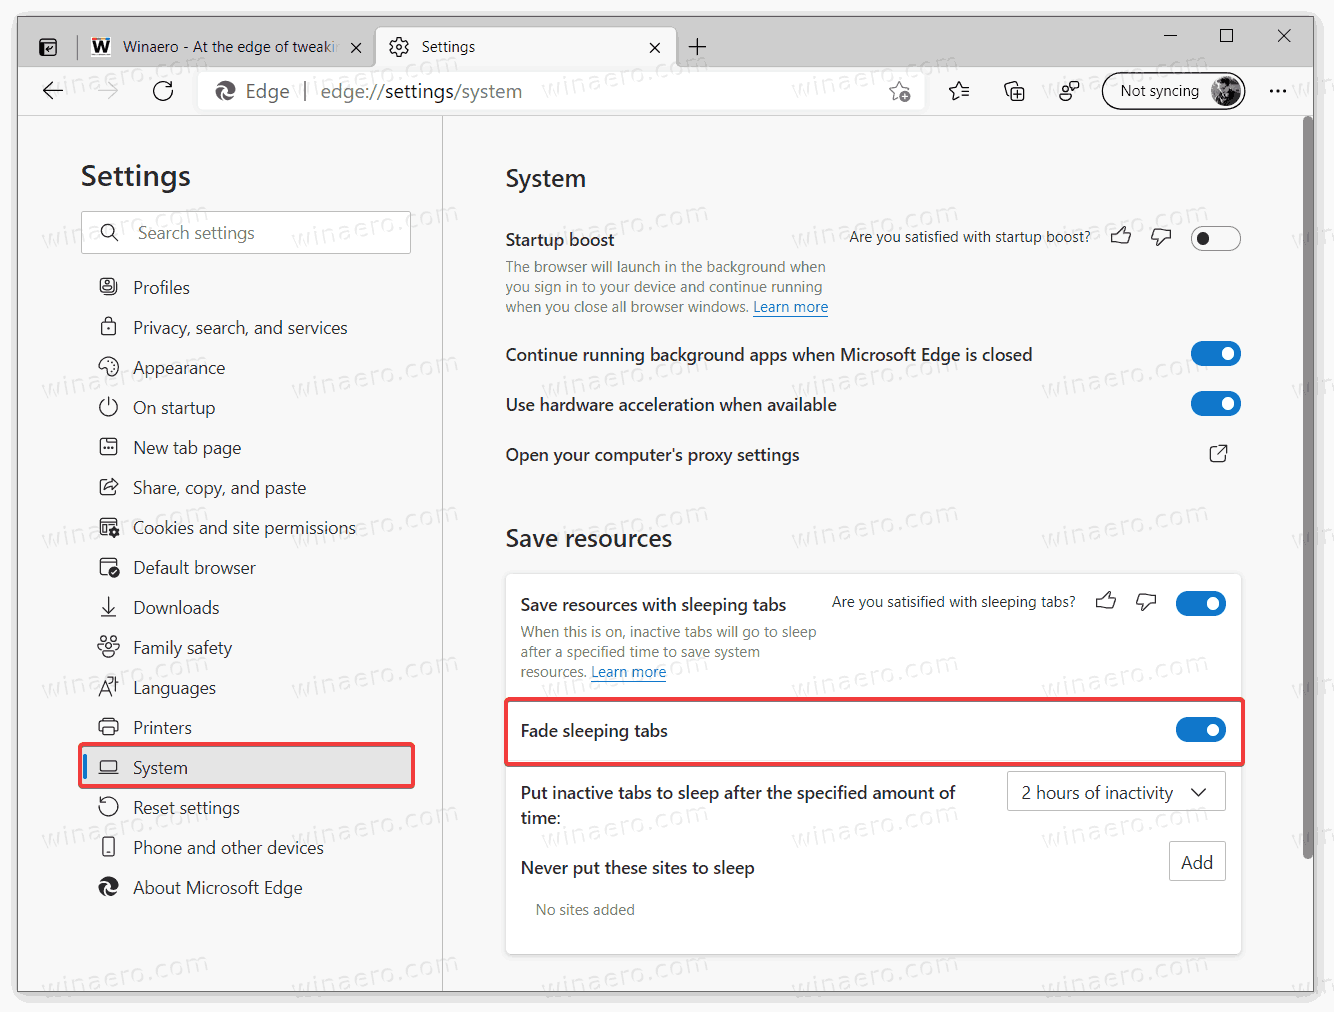 Disable Tab Fading In Microsoft Edge